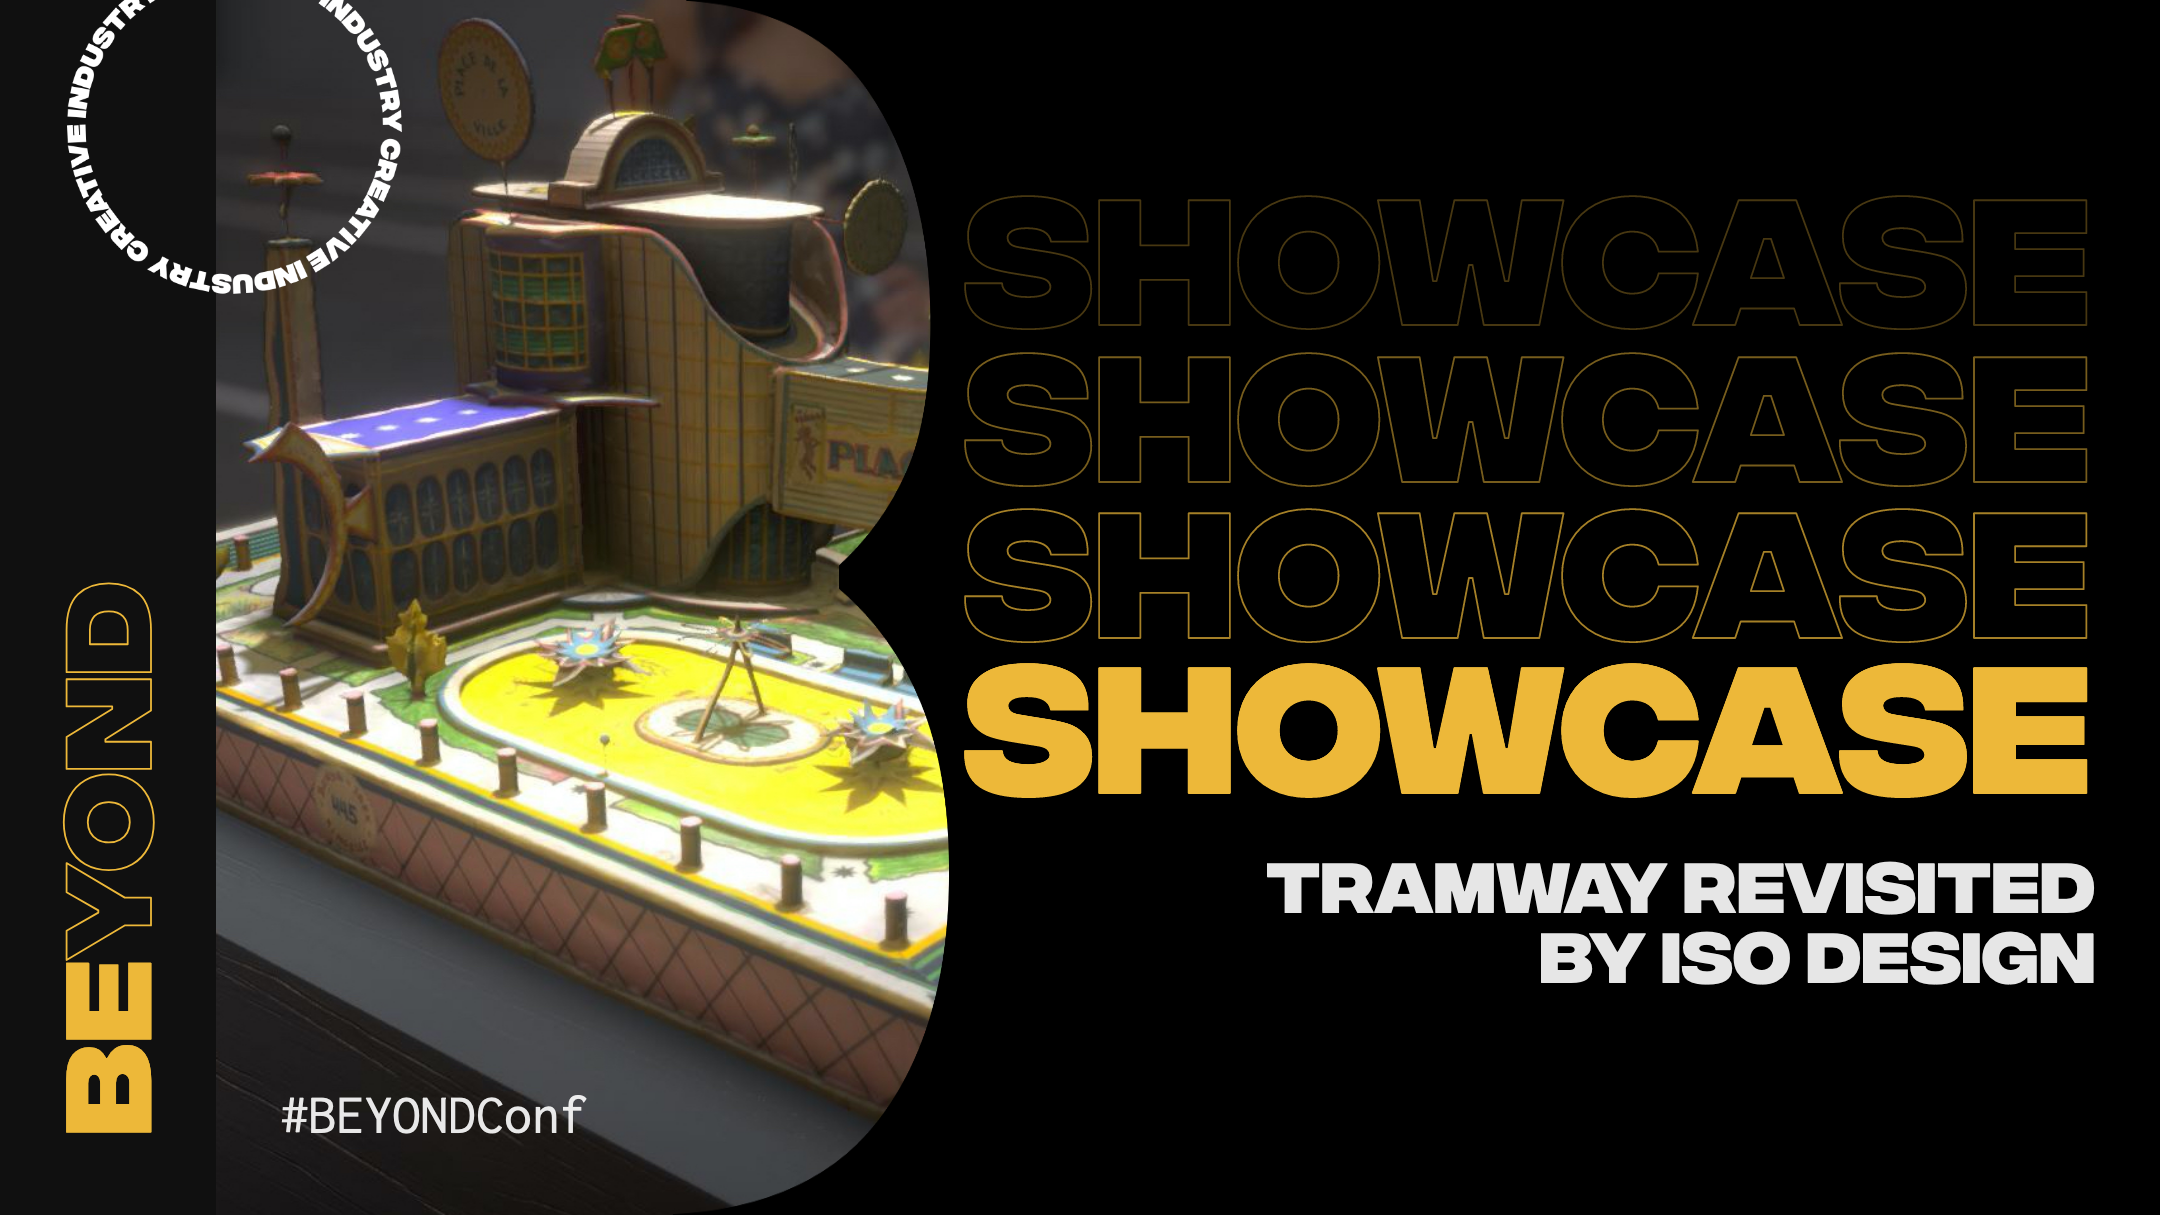 tramway_revisited_SHOWCASE_BEYOND_Edit